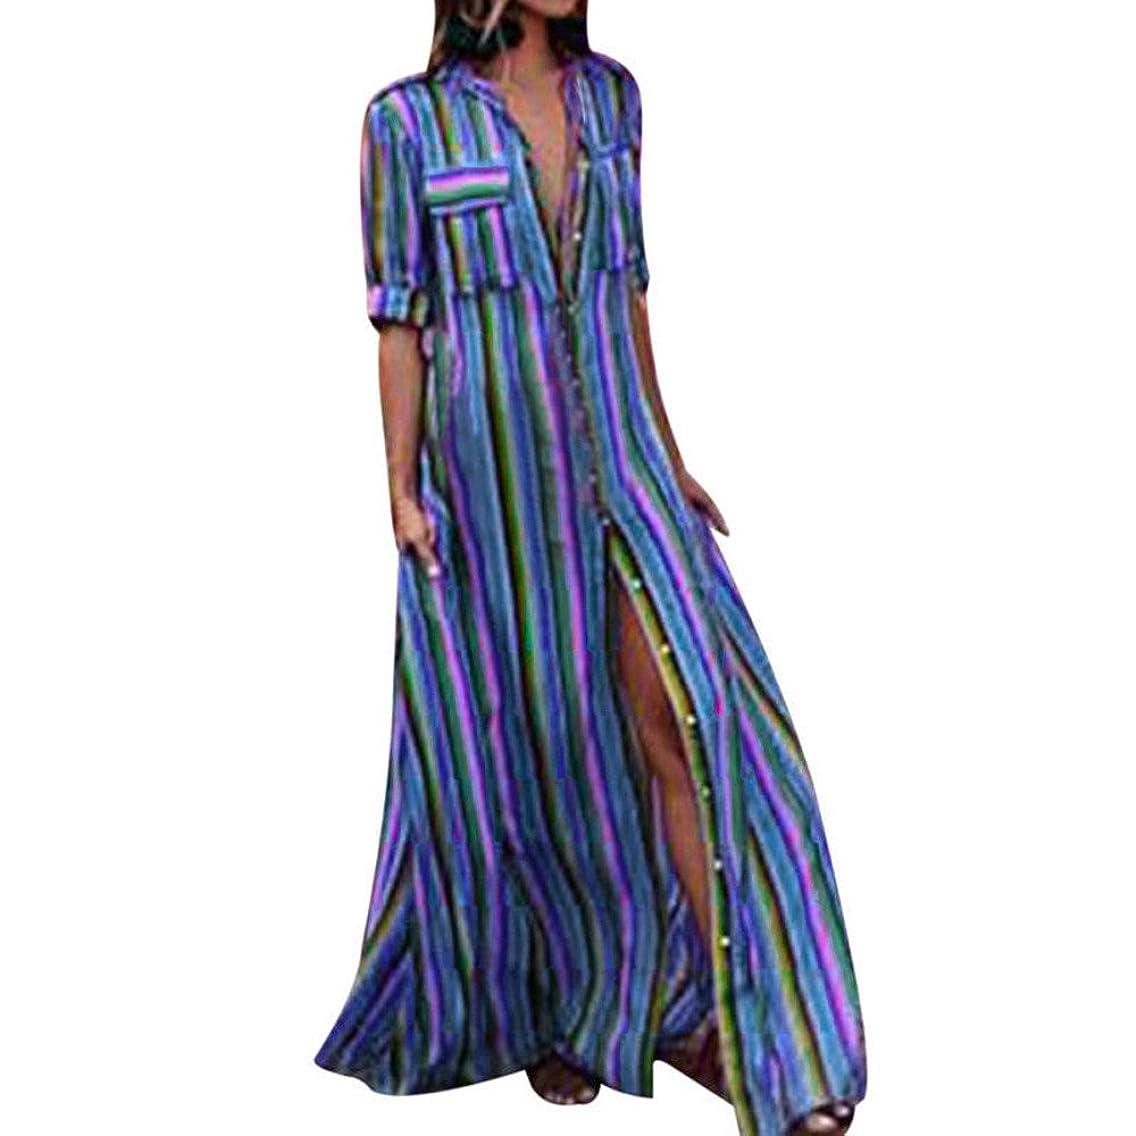 POTO Dress for Women,Striped Multicolor Button Bohe Long Robe Dress Evening Party Dress Beach Dress Sundress